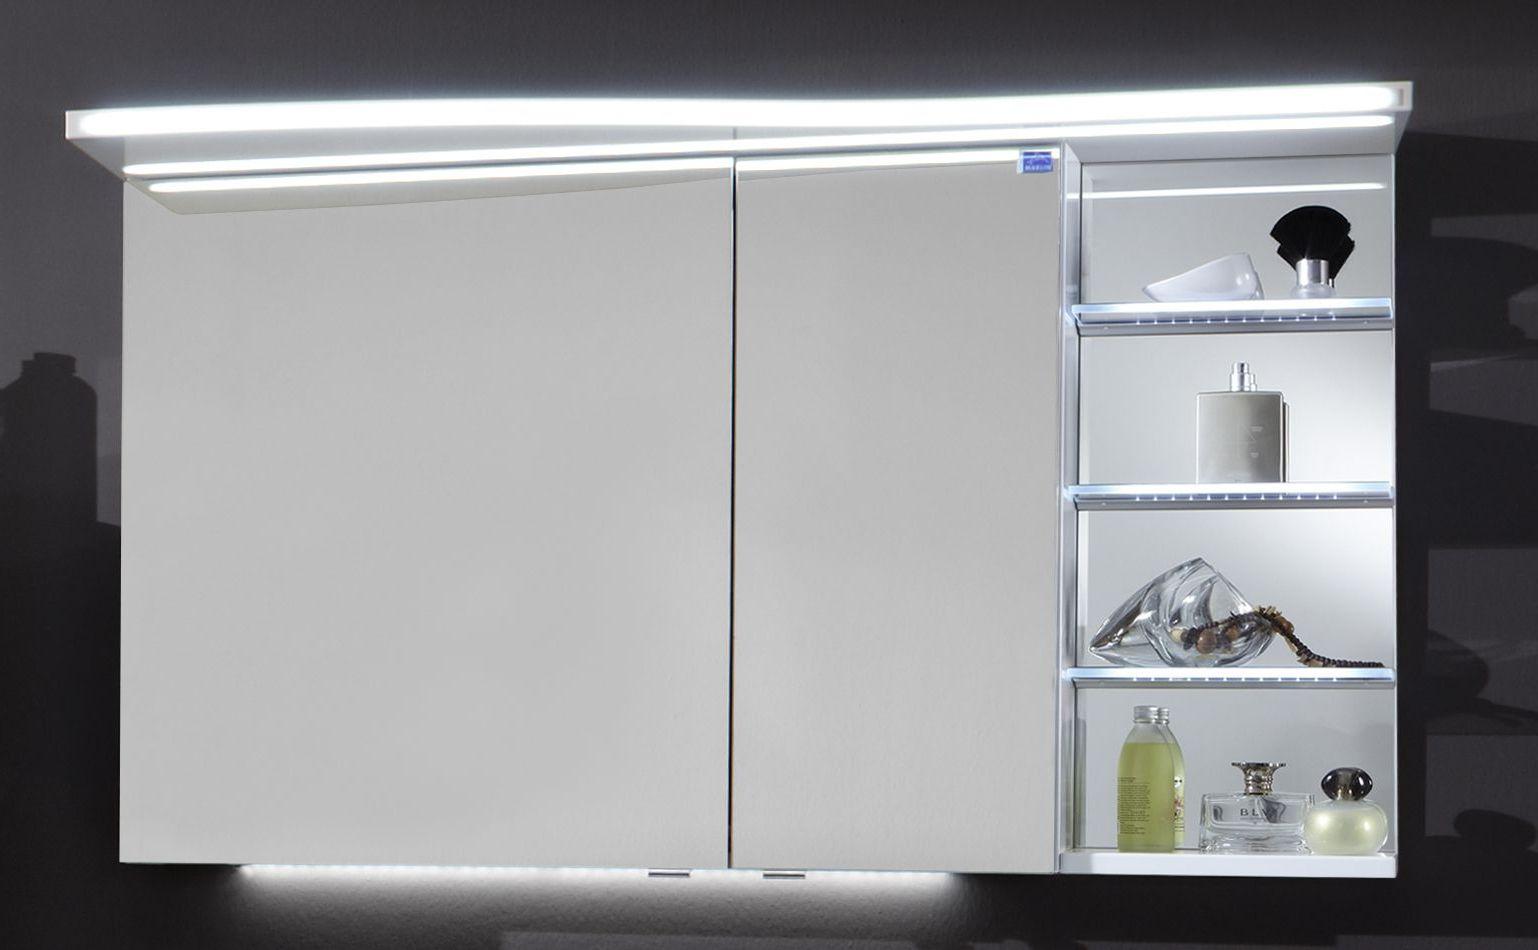 marlin bad 3160 motion spiegelschrank 120 cm breit sobs63r sobs63rls badm bel 1. Black Bedroom Furniture Sets. Home Design Ideas